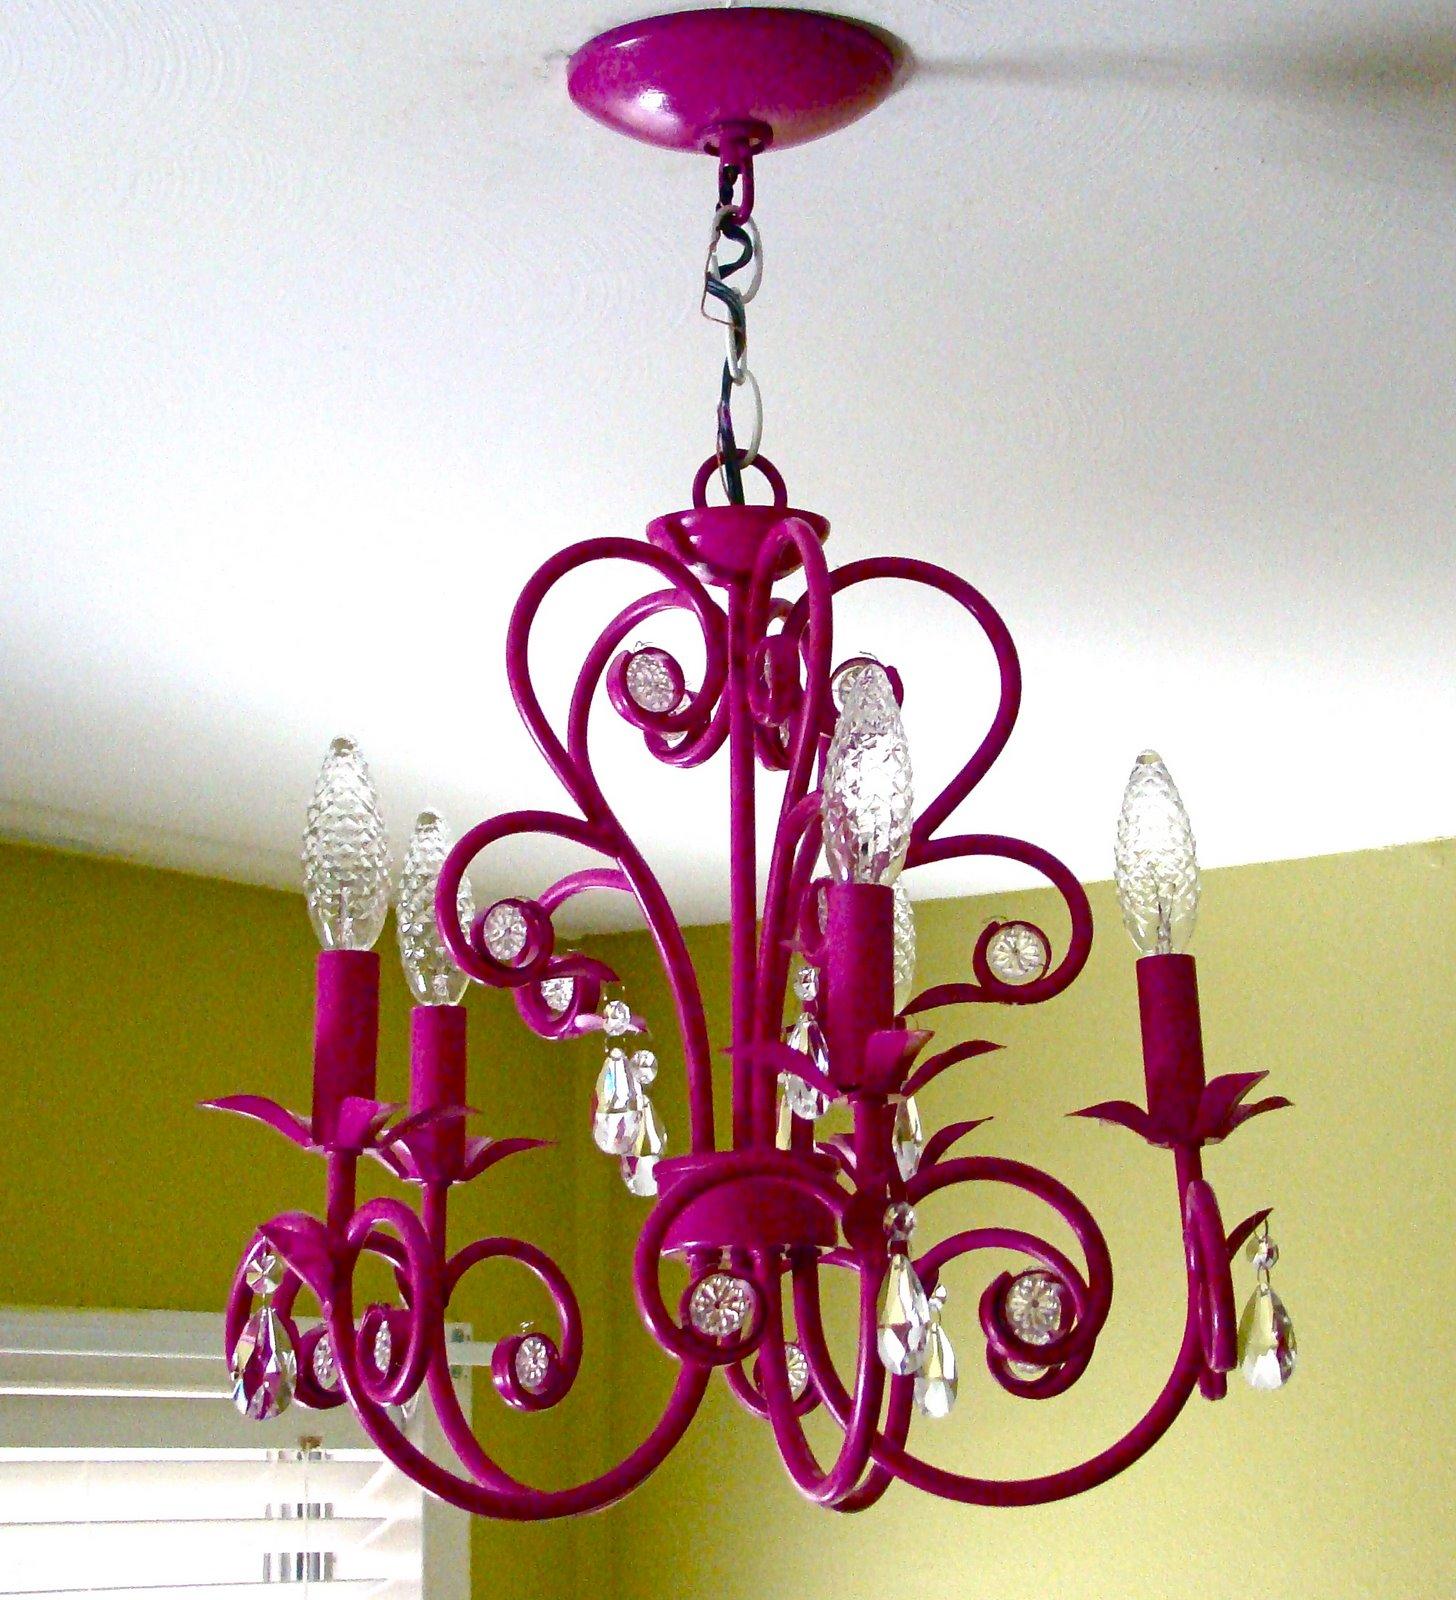 Dale un aspecto moderno a tu hogar siguiendo estas sencillas ideas 03